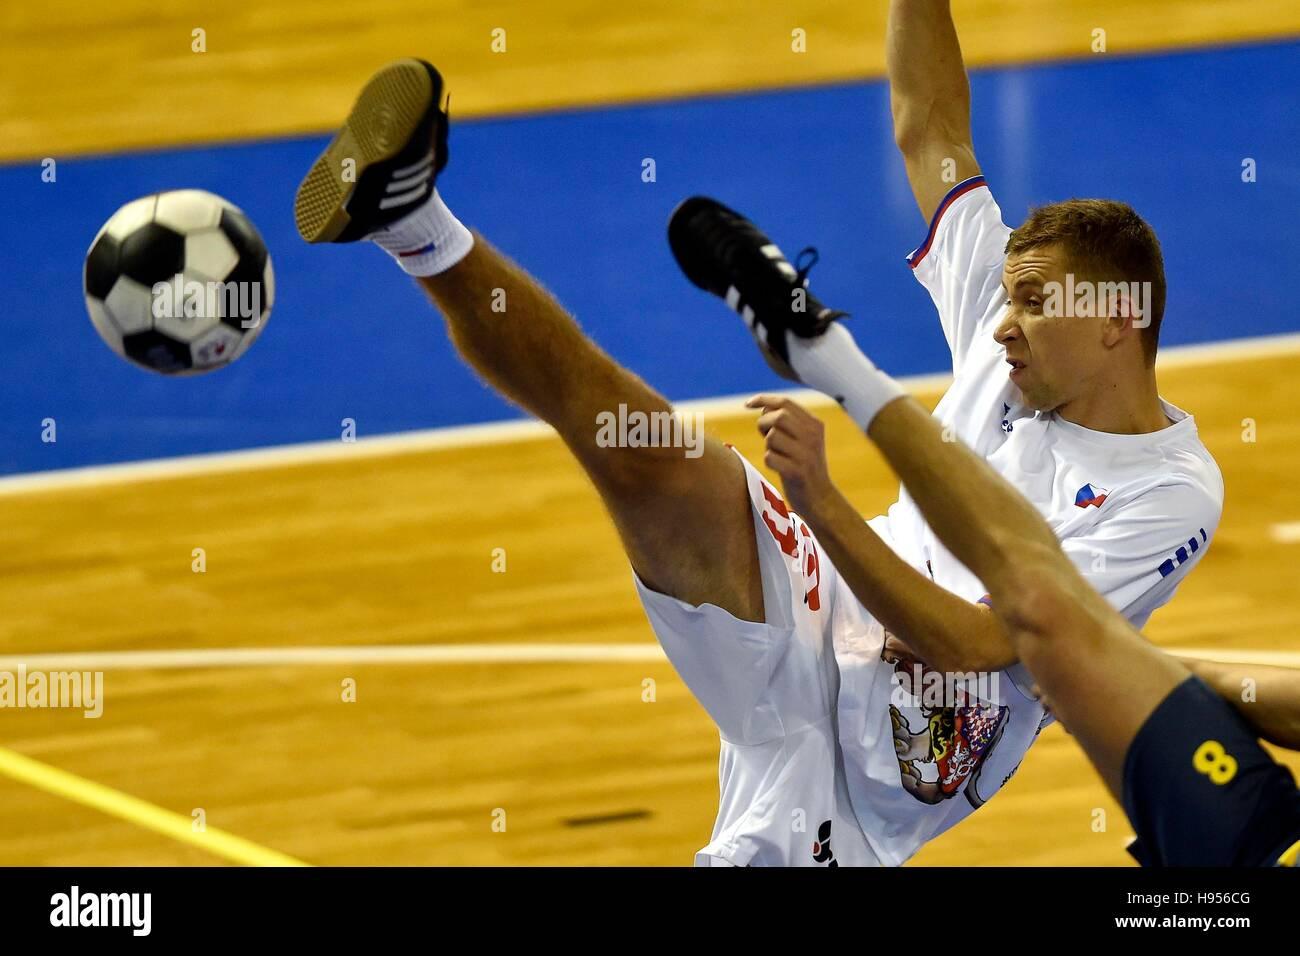 Czech futnet player jakub pospisil in action during the futnet world championship 2016 in brno